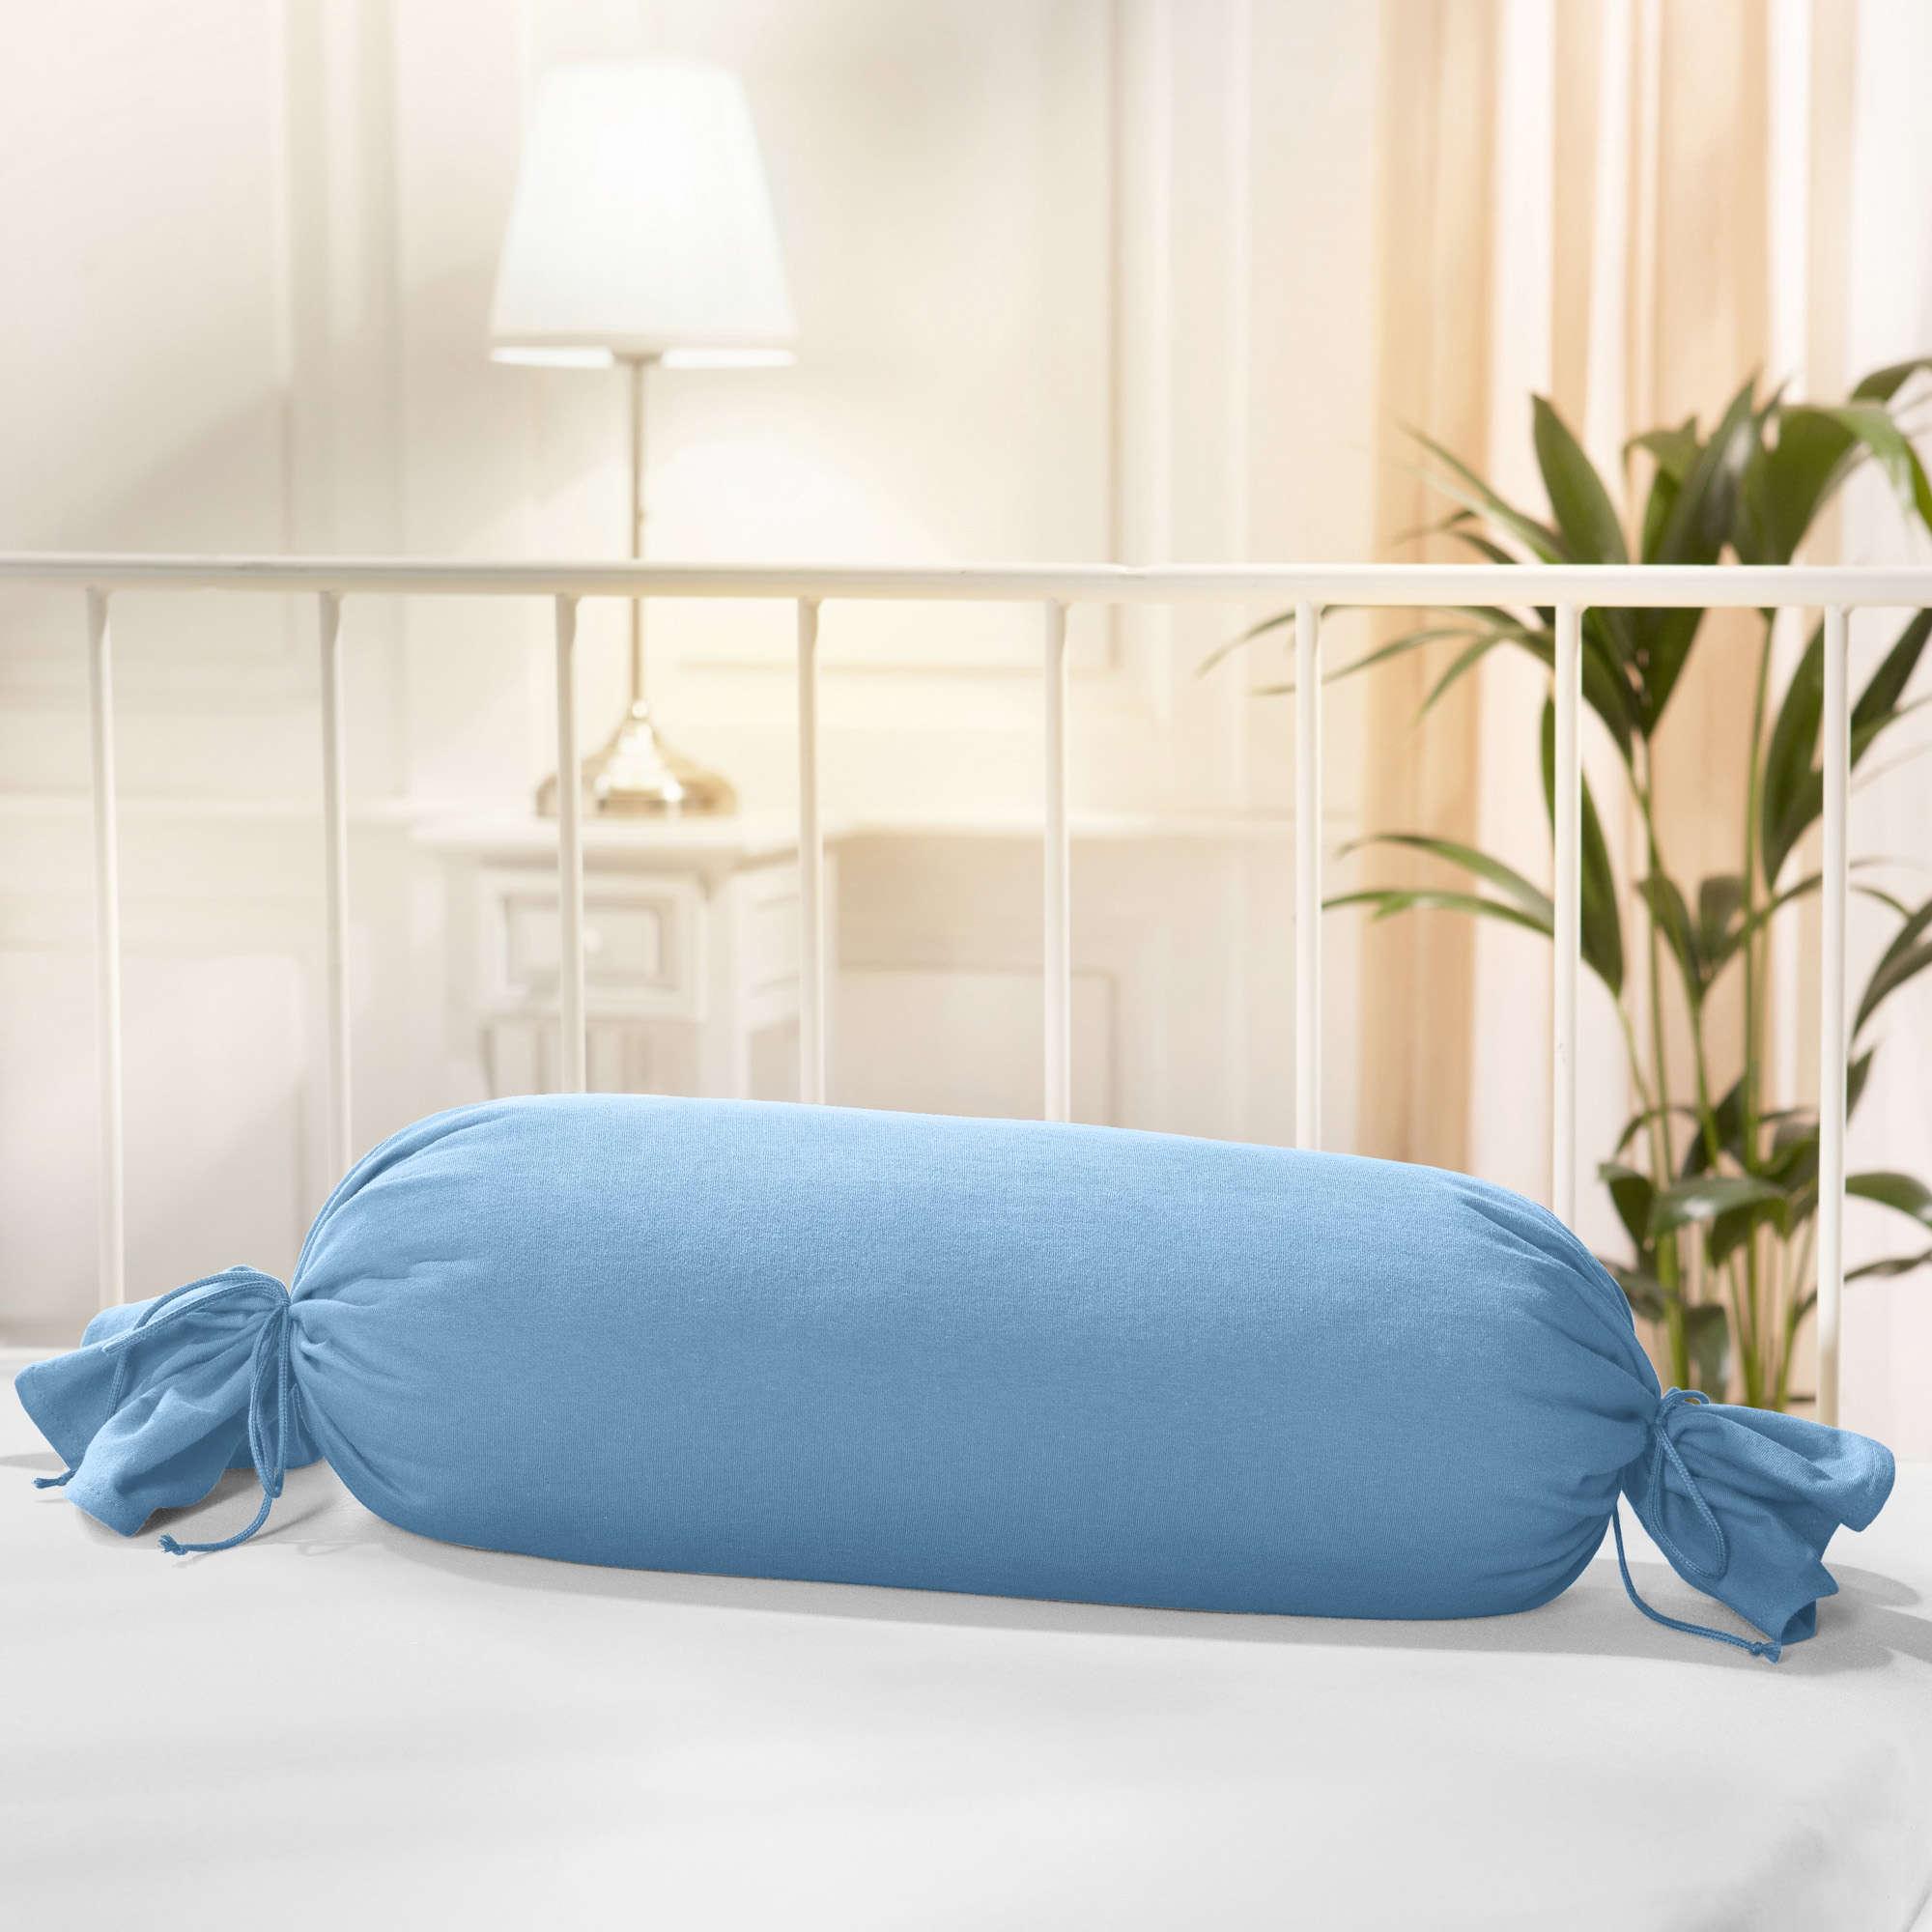 erwin m ller nackenrollenbezug rosenheim single jersey ebay. Black Bedroom Furniture Sets. Home Design Ideas